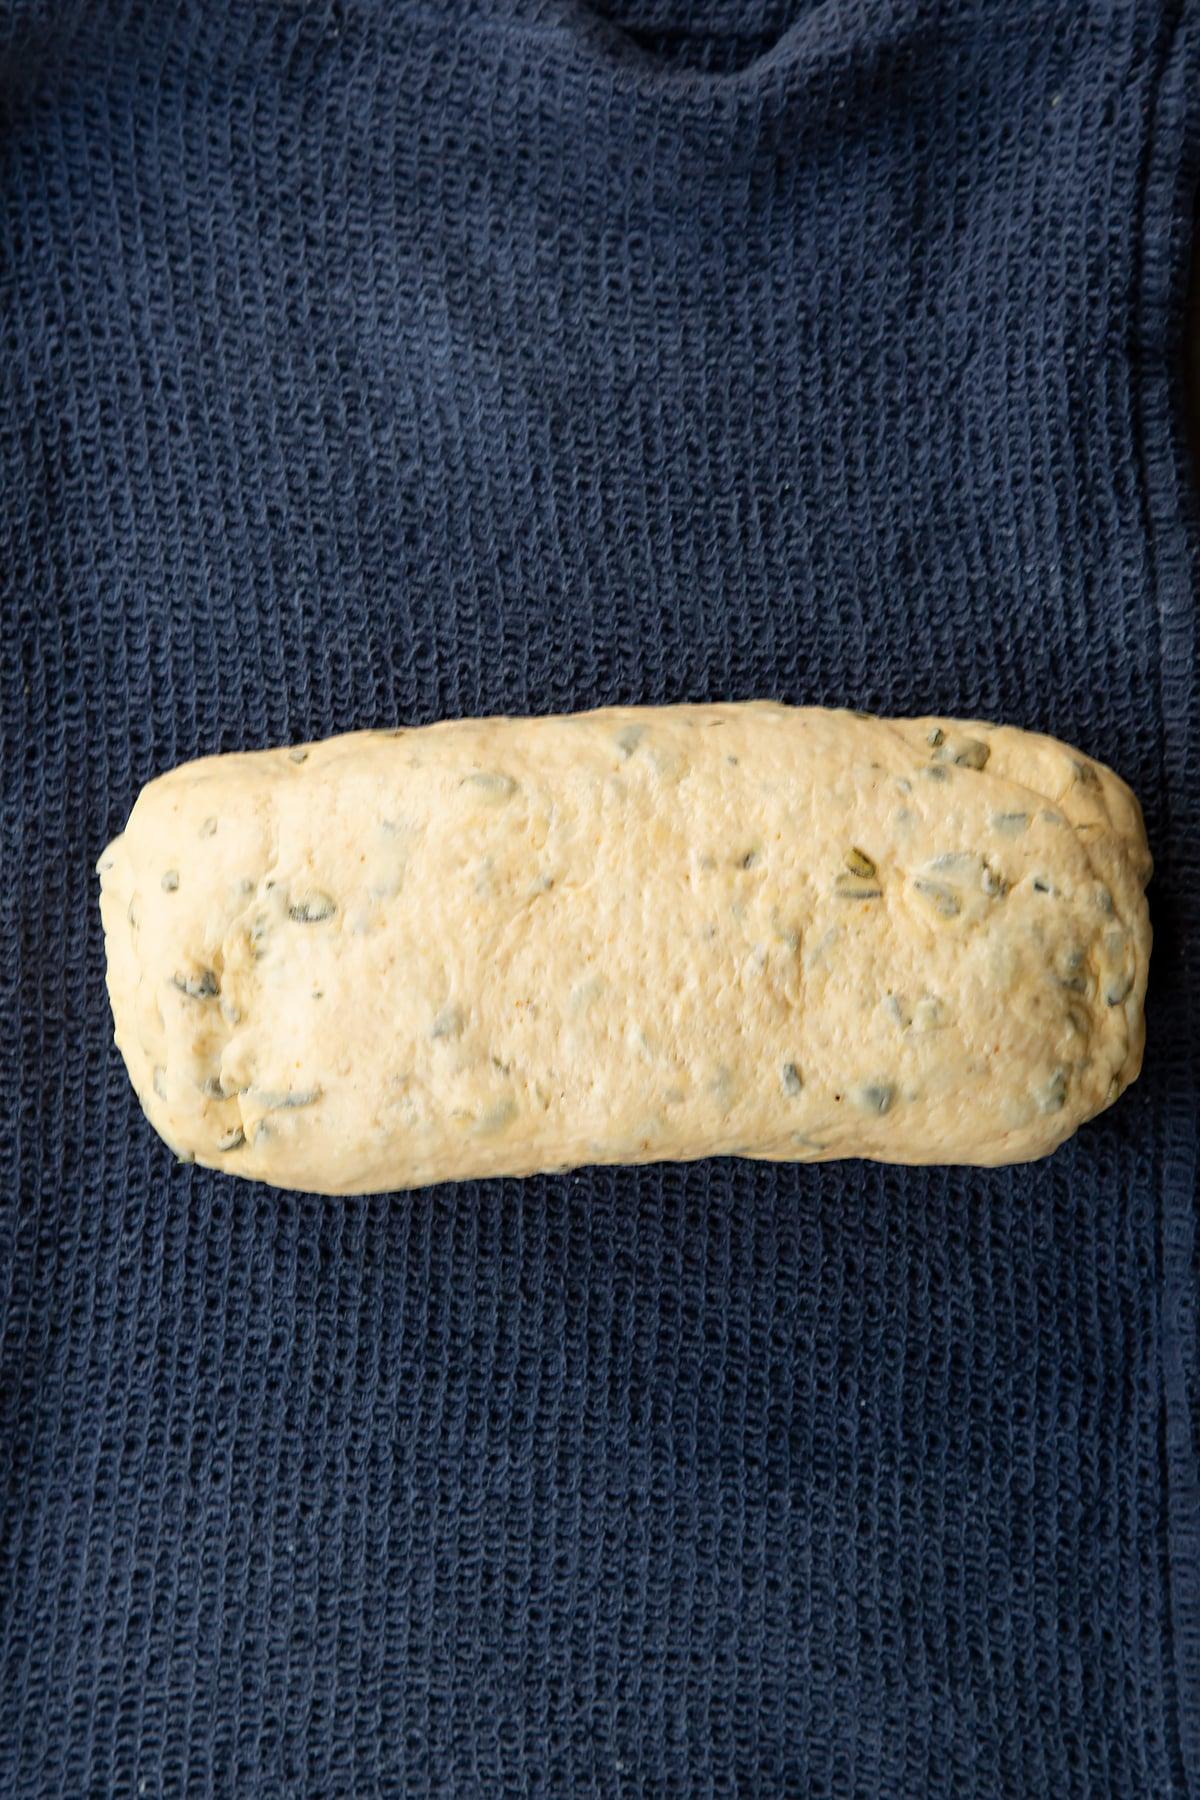 A roll of pumpkin seed bread dough on a wet tea towel.